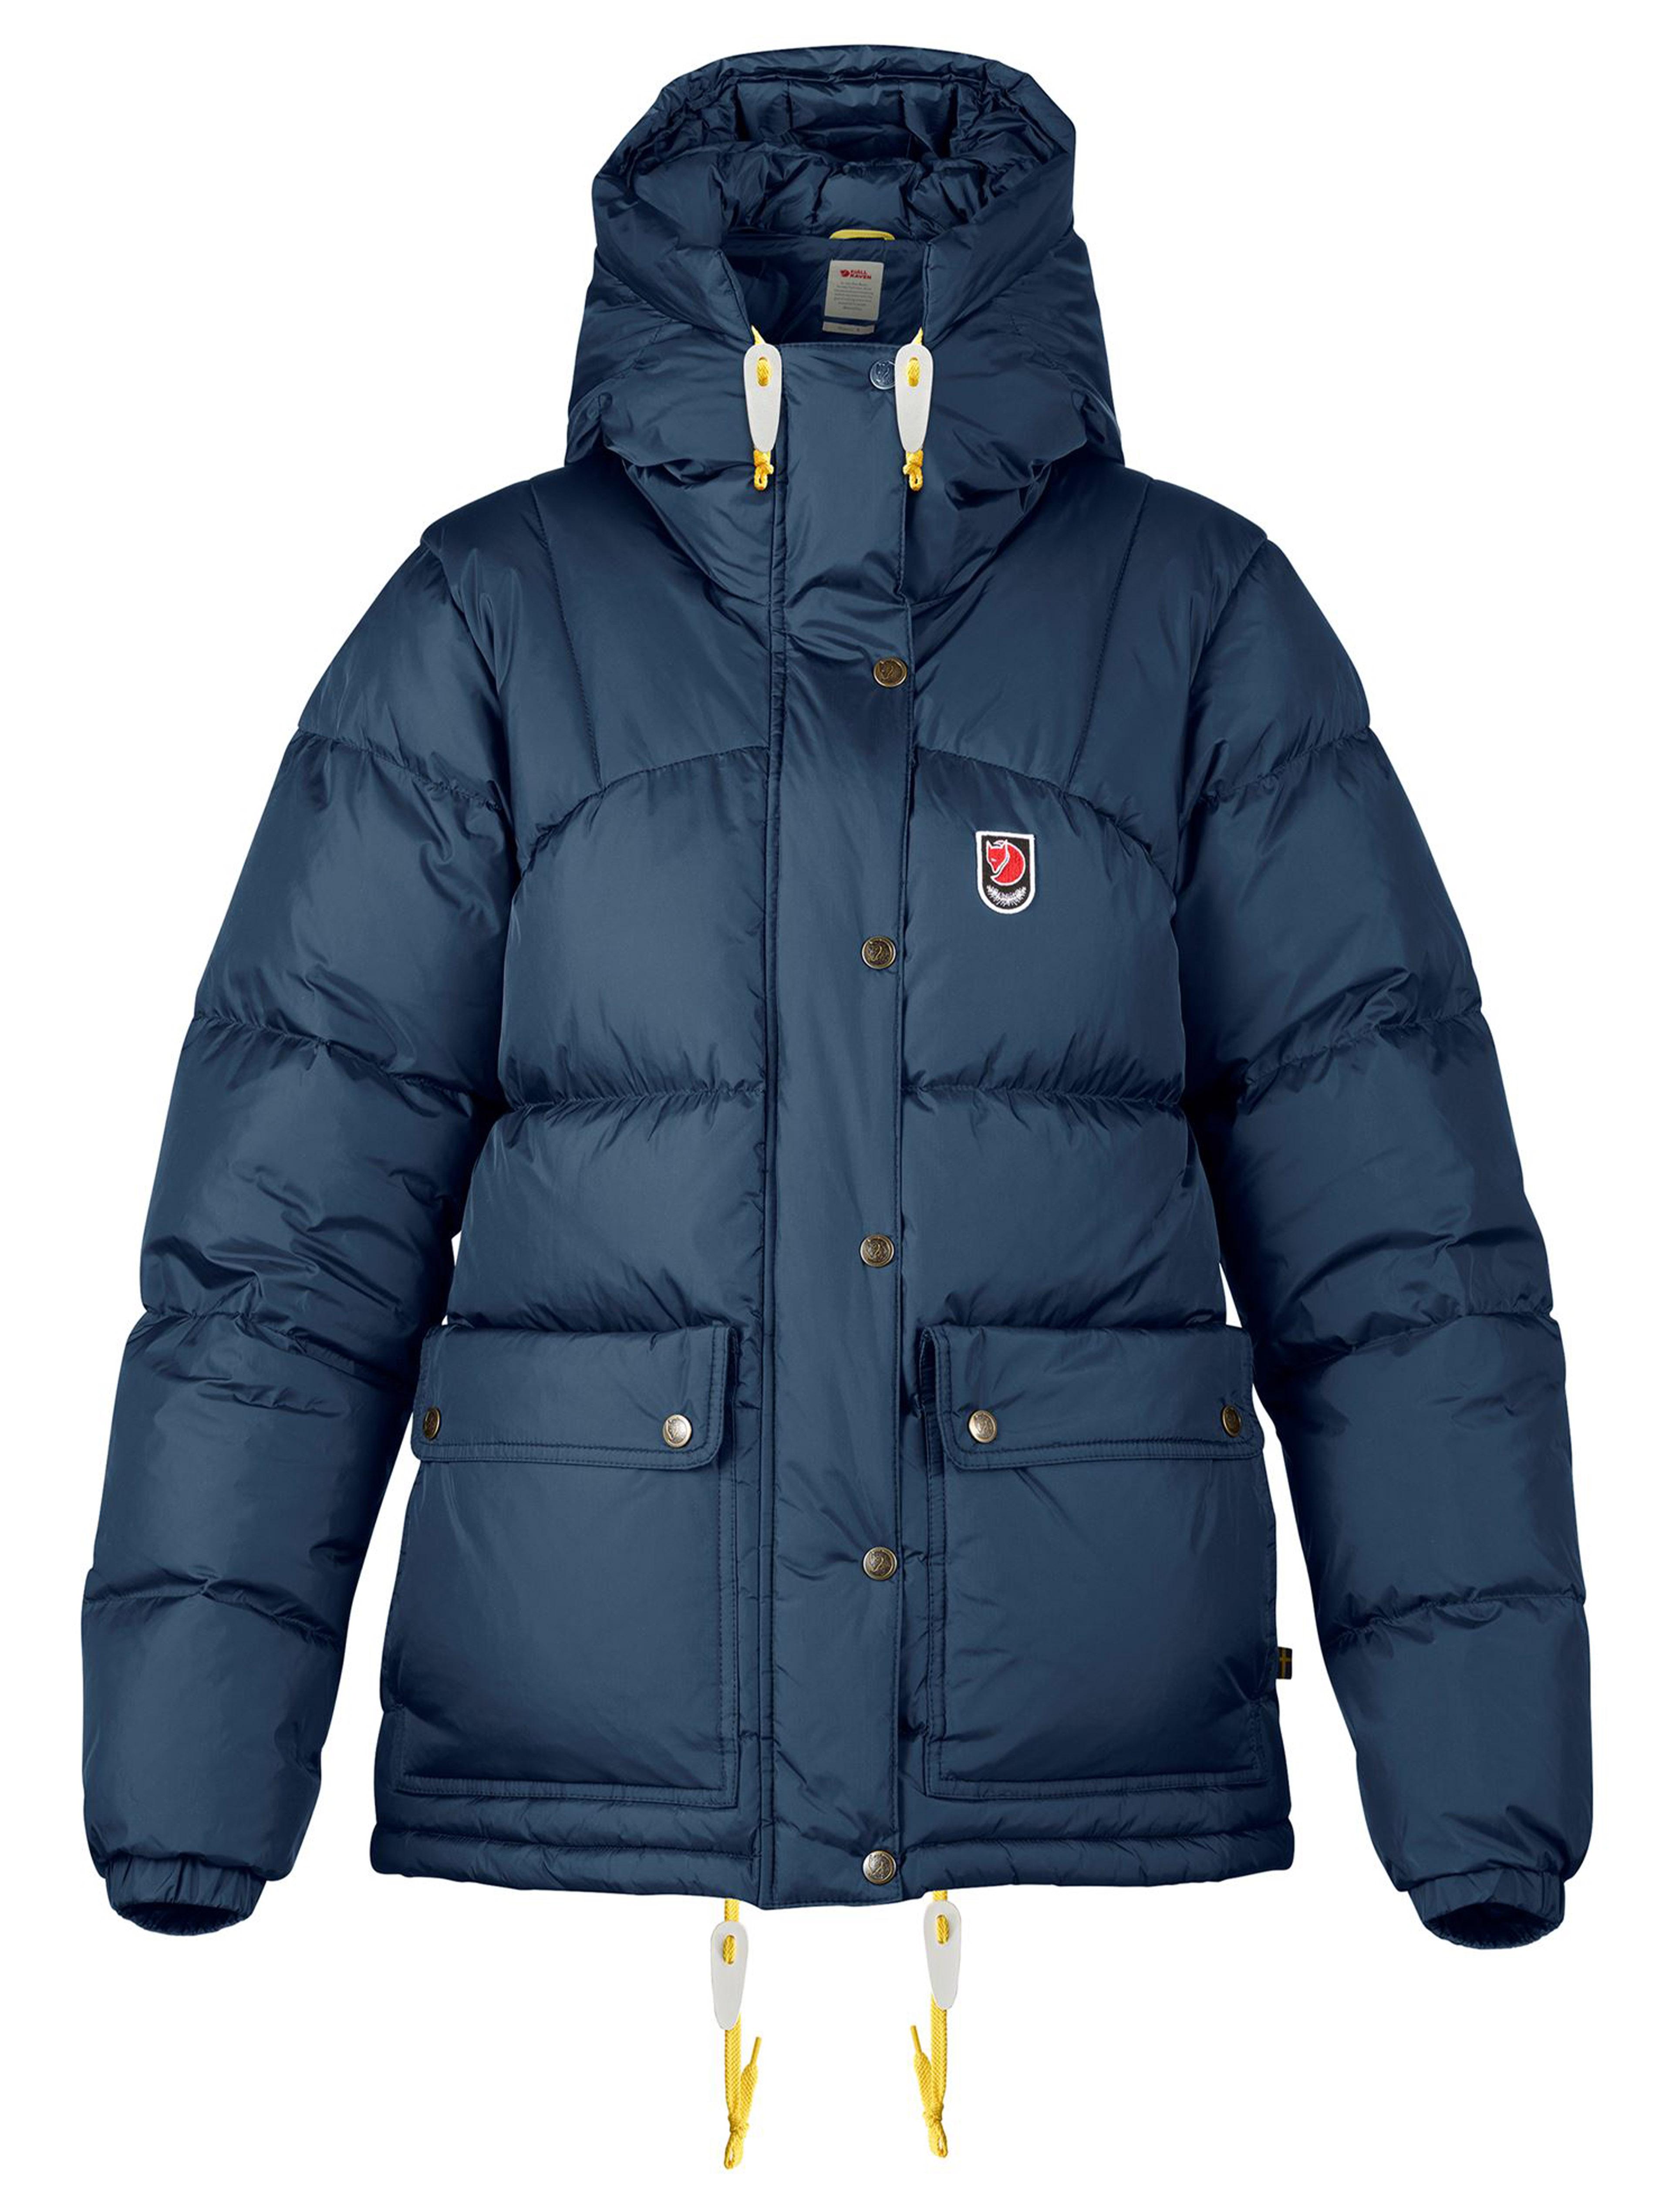 Fjällräven Dunjacka expedition down jacket w navy | NK